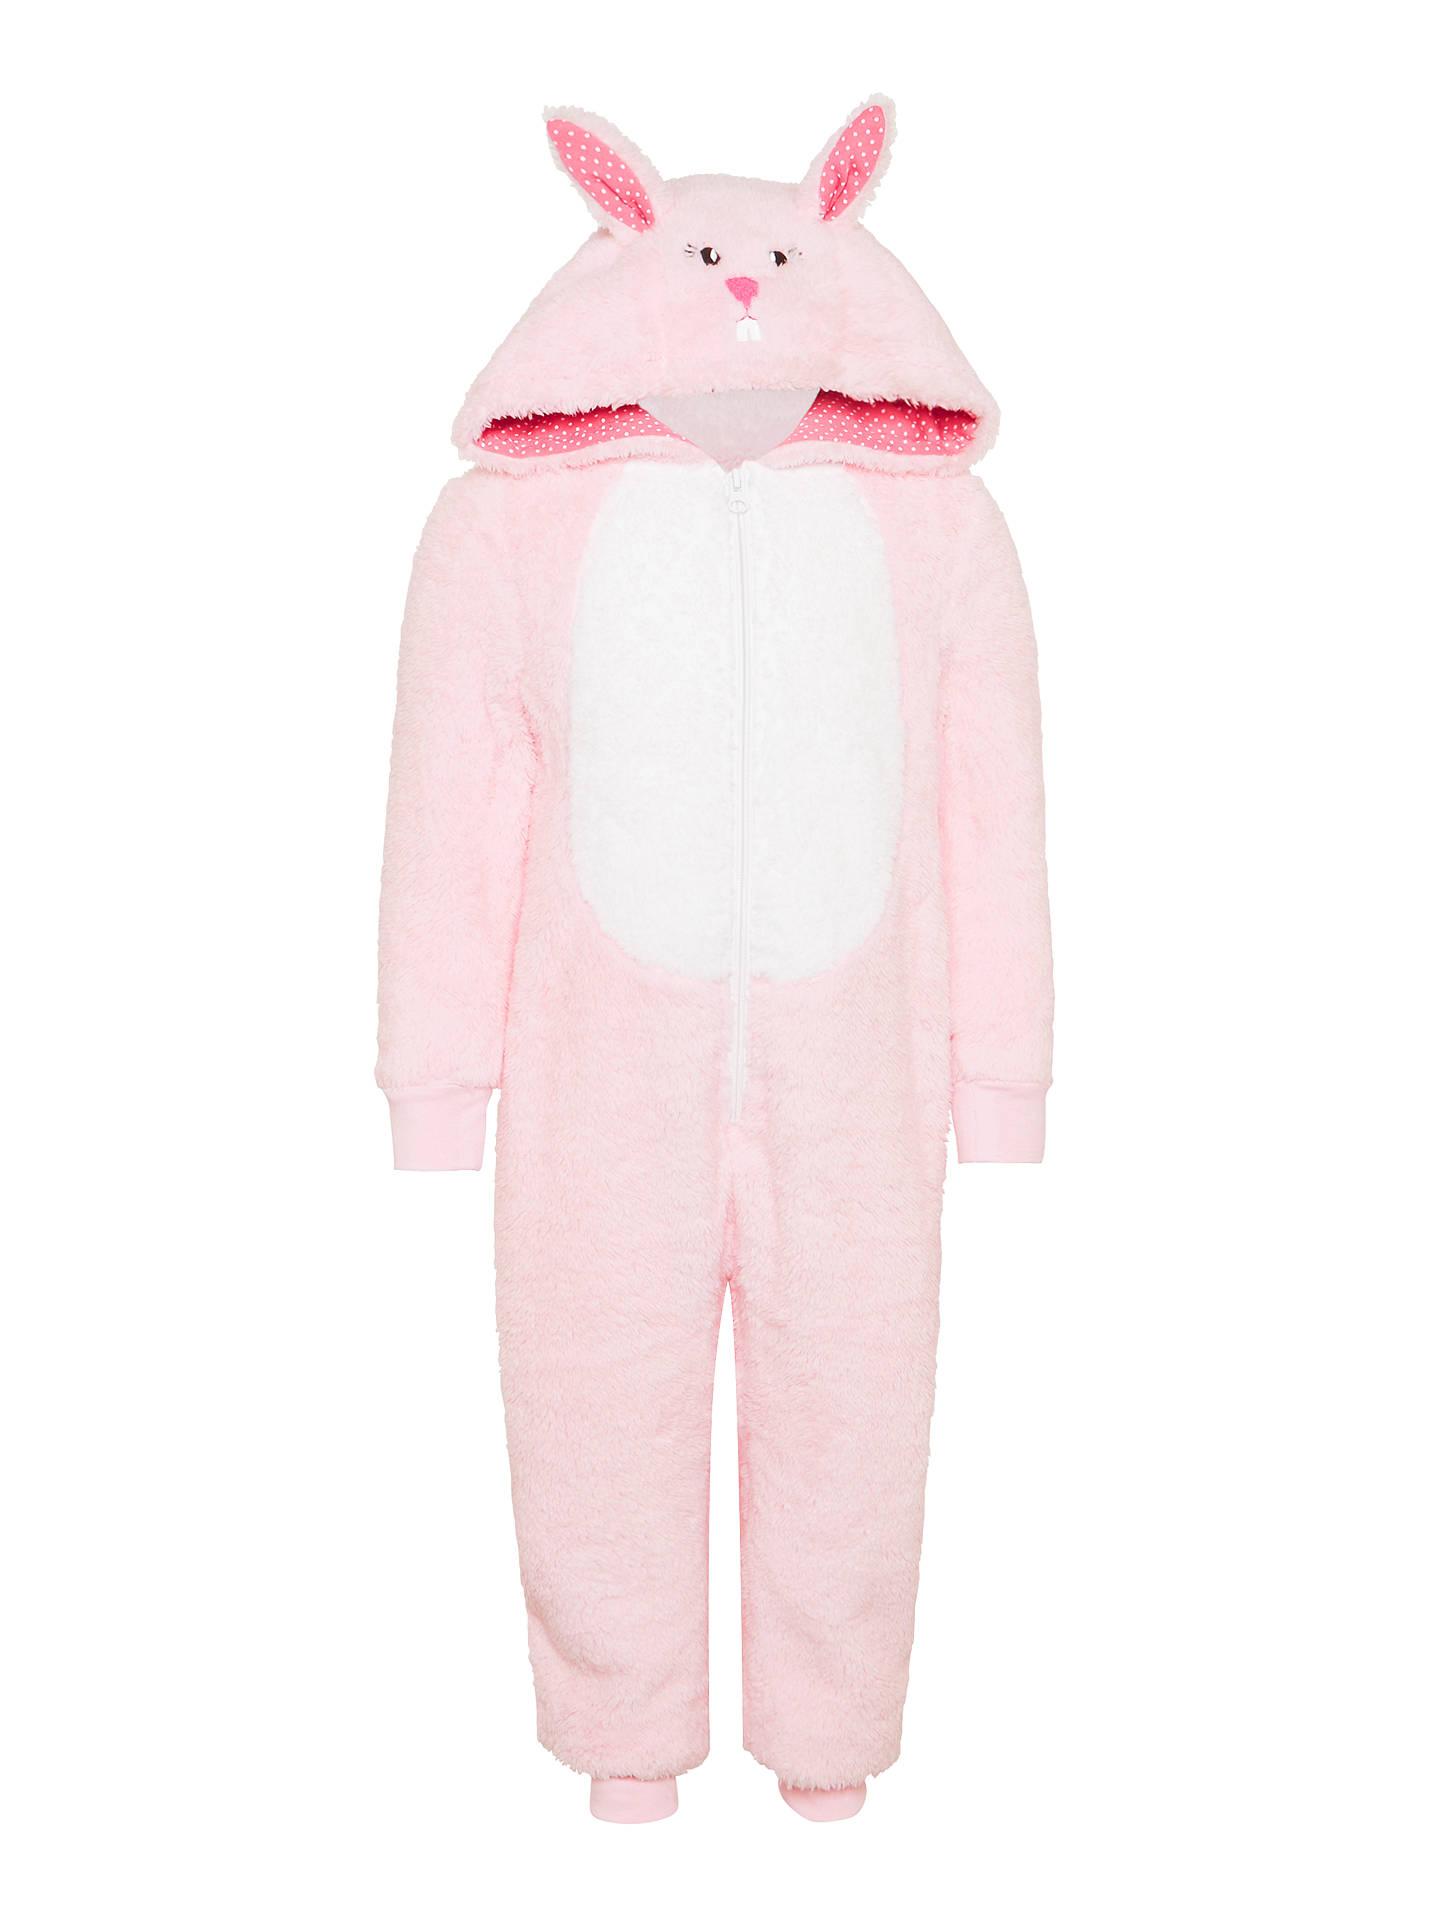 buyjohn lewis childrens bunny onesie pink 3 years online at johnlewis